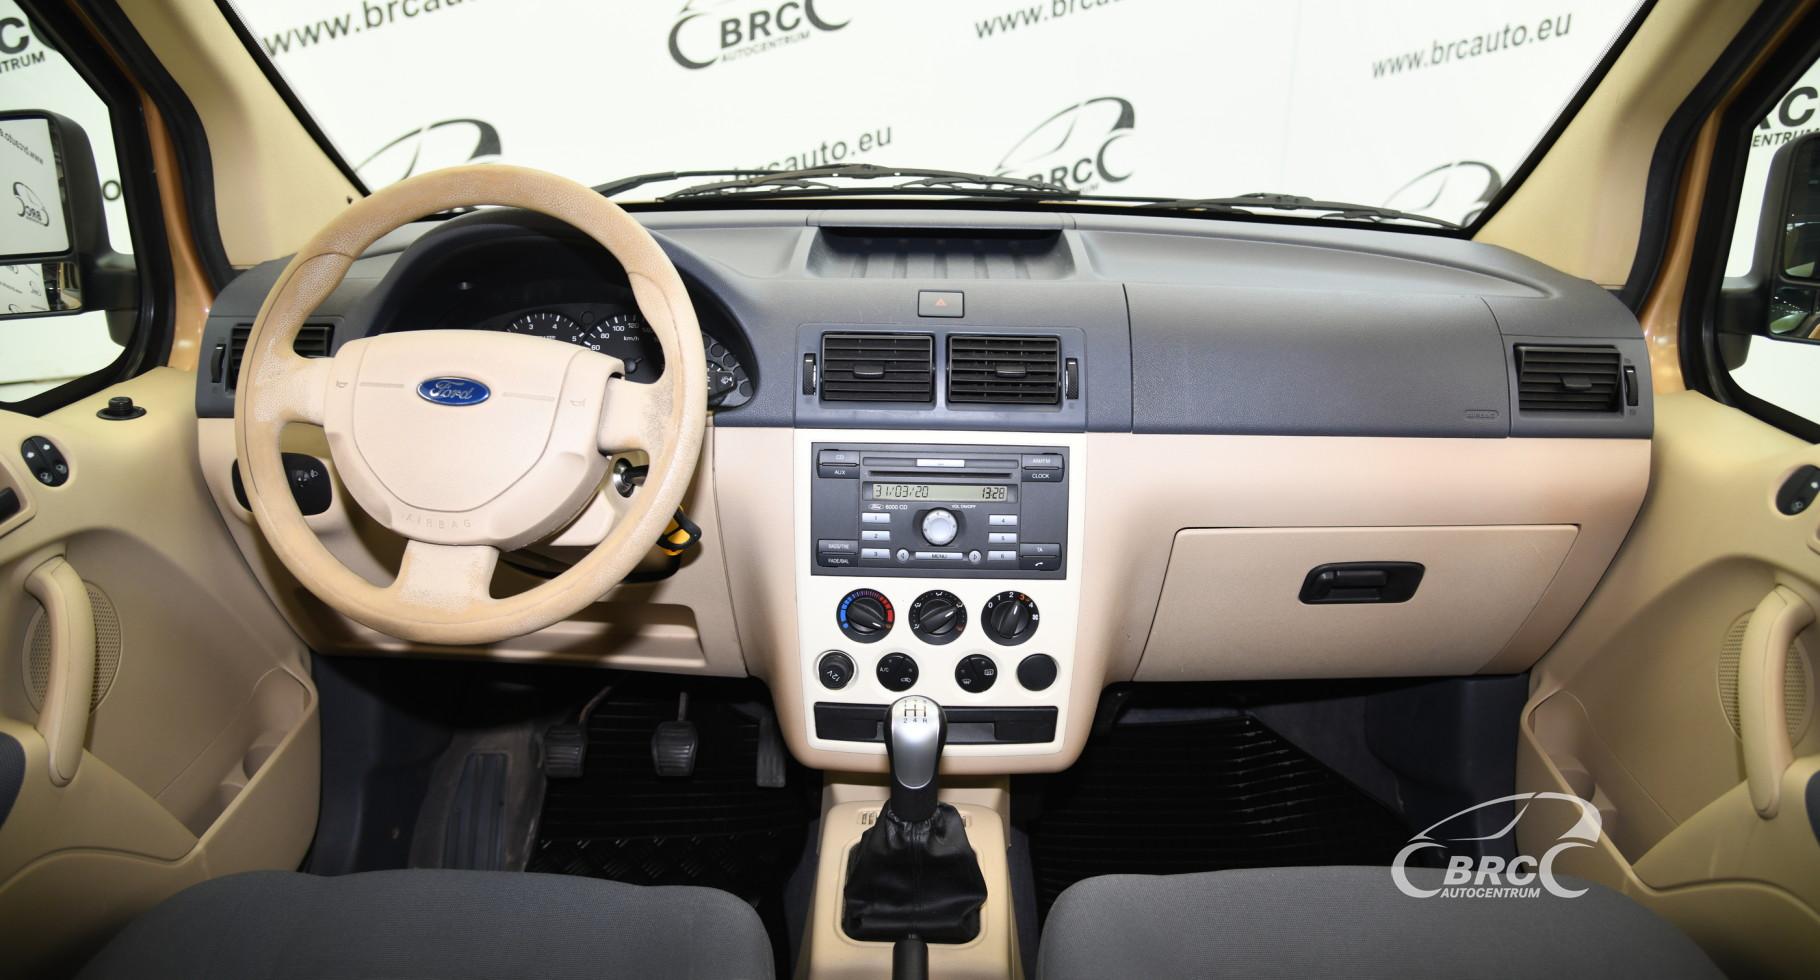 Ford Tourneo Connect 1.8 TDCi GLX